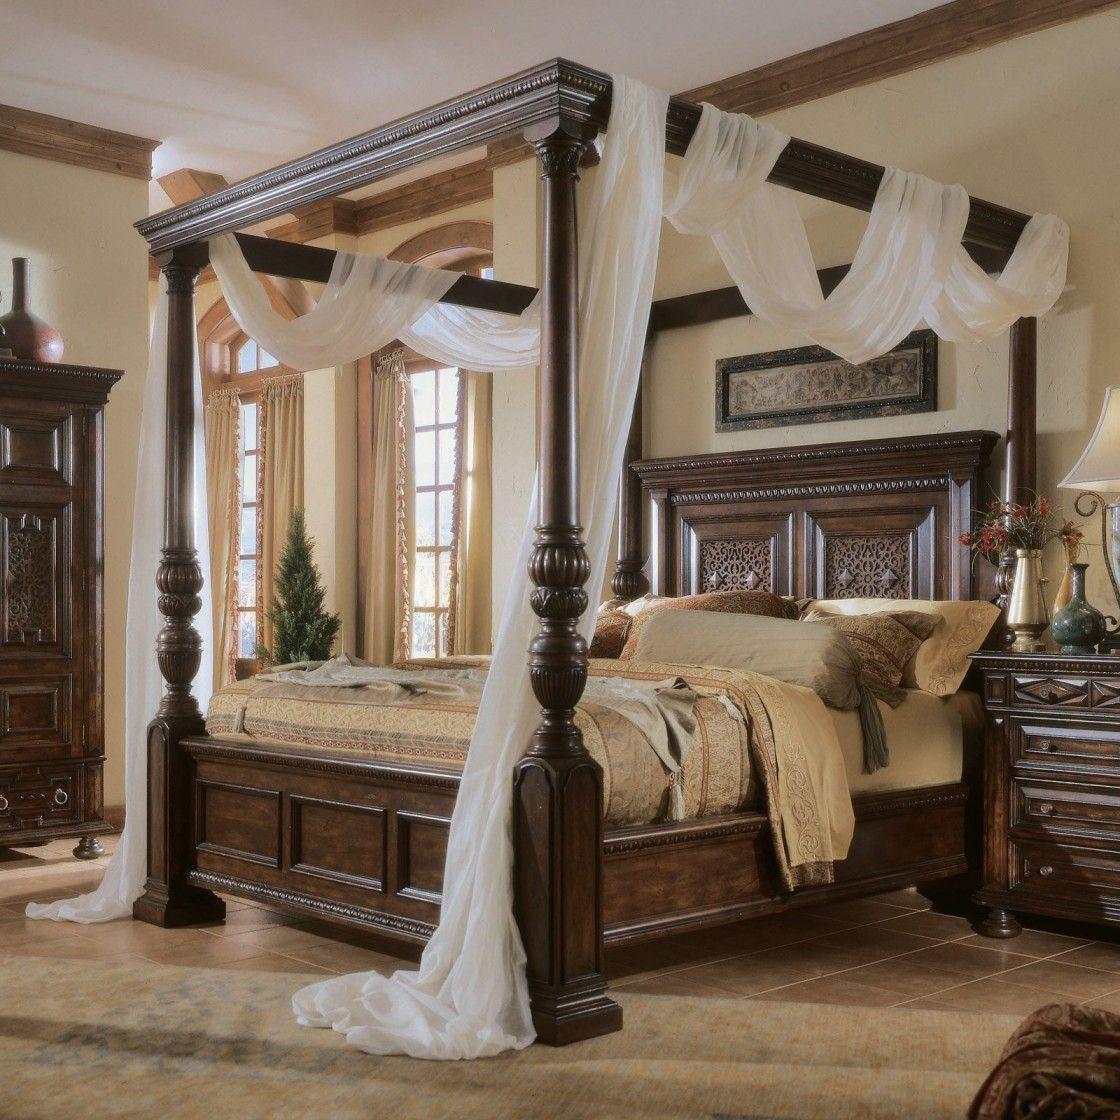 10 amazing diy canopy bed designs 10 amazing diy canopy